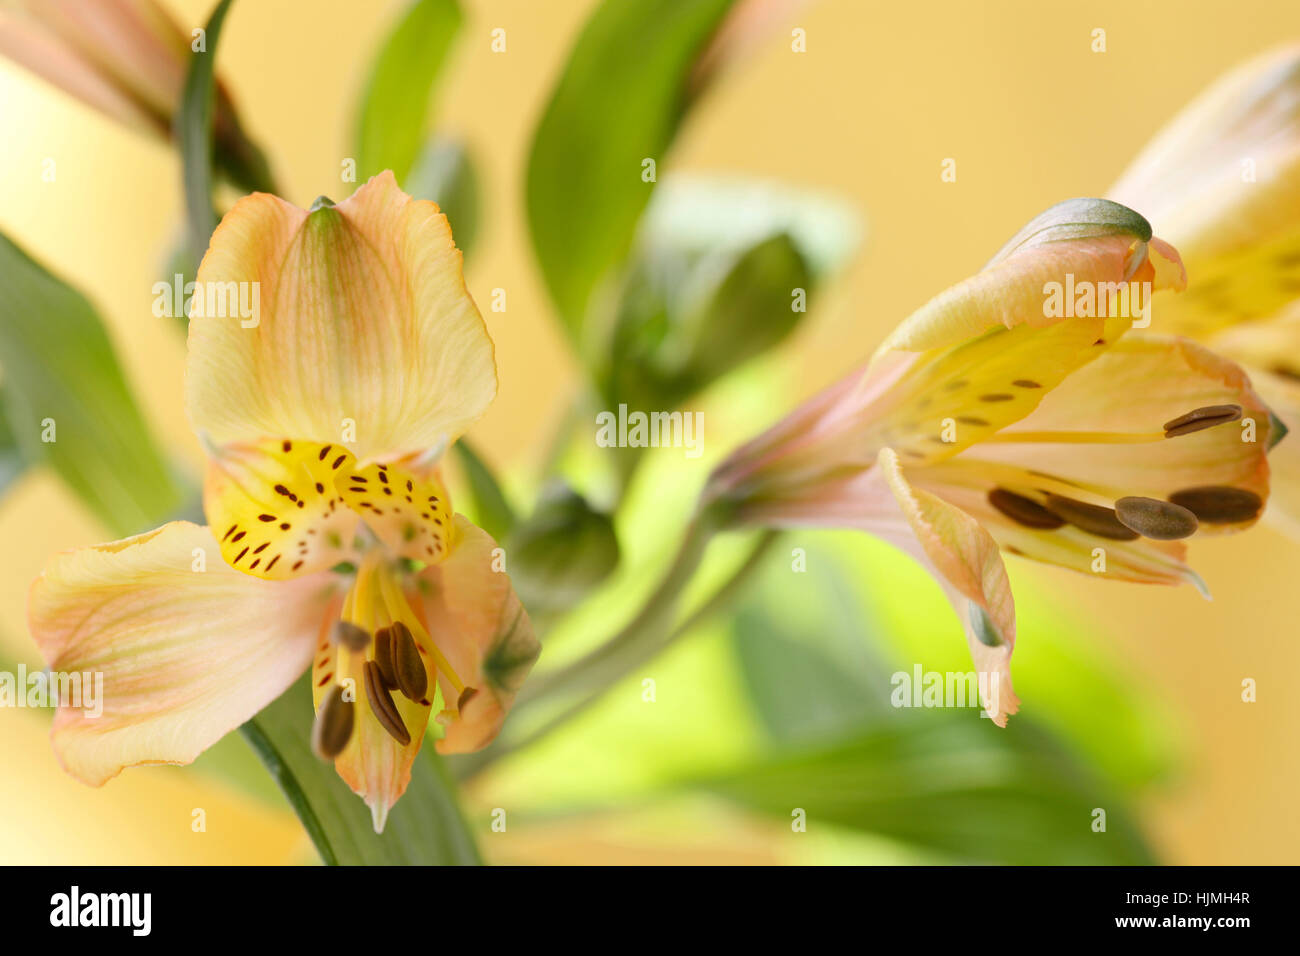 Elegant Yellow Alstroemeria Flower Symbolizes Friendship And